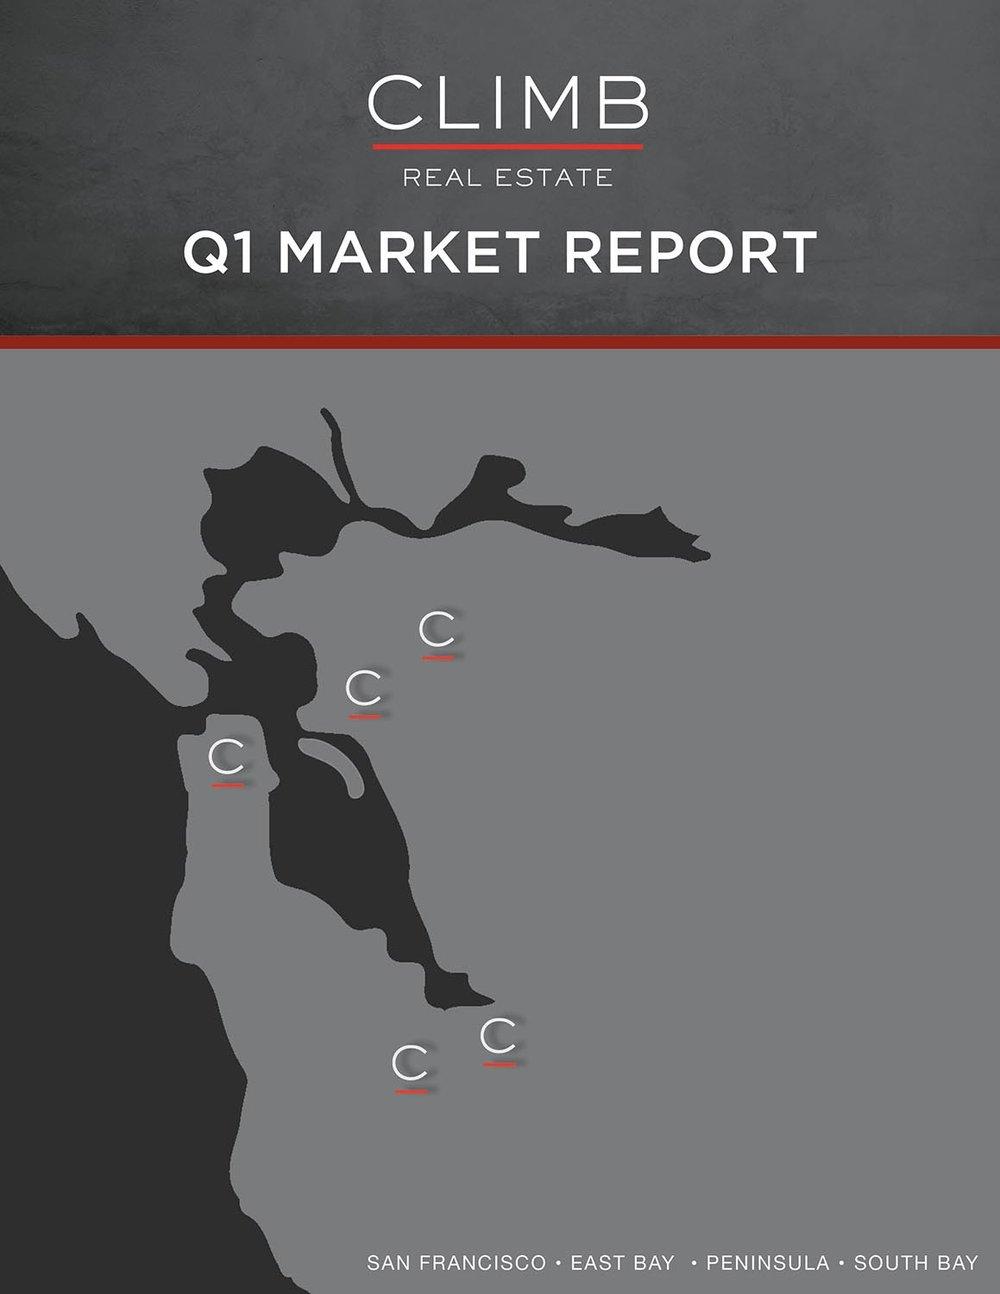 Climb-Q1-Market-Report-2018-web.jpg